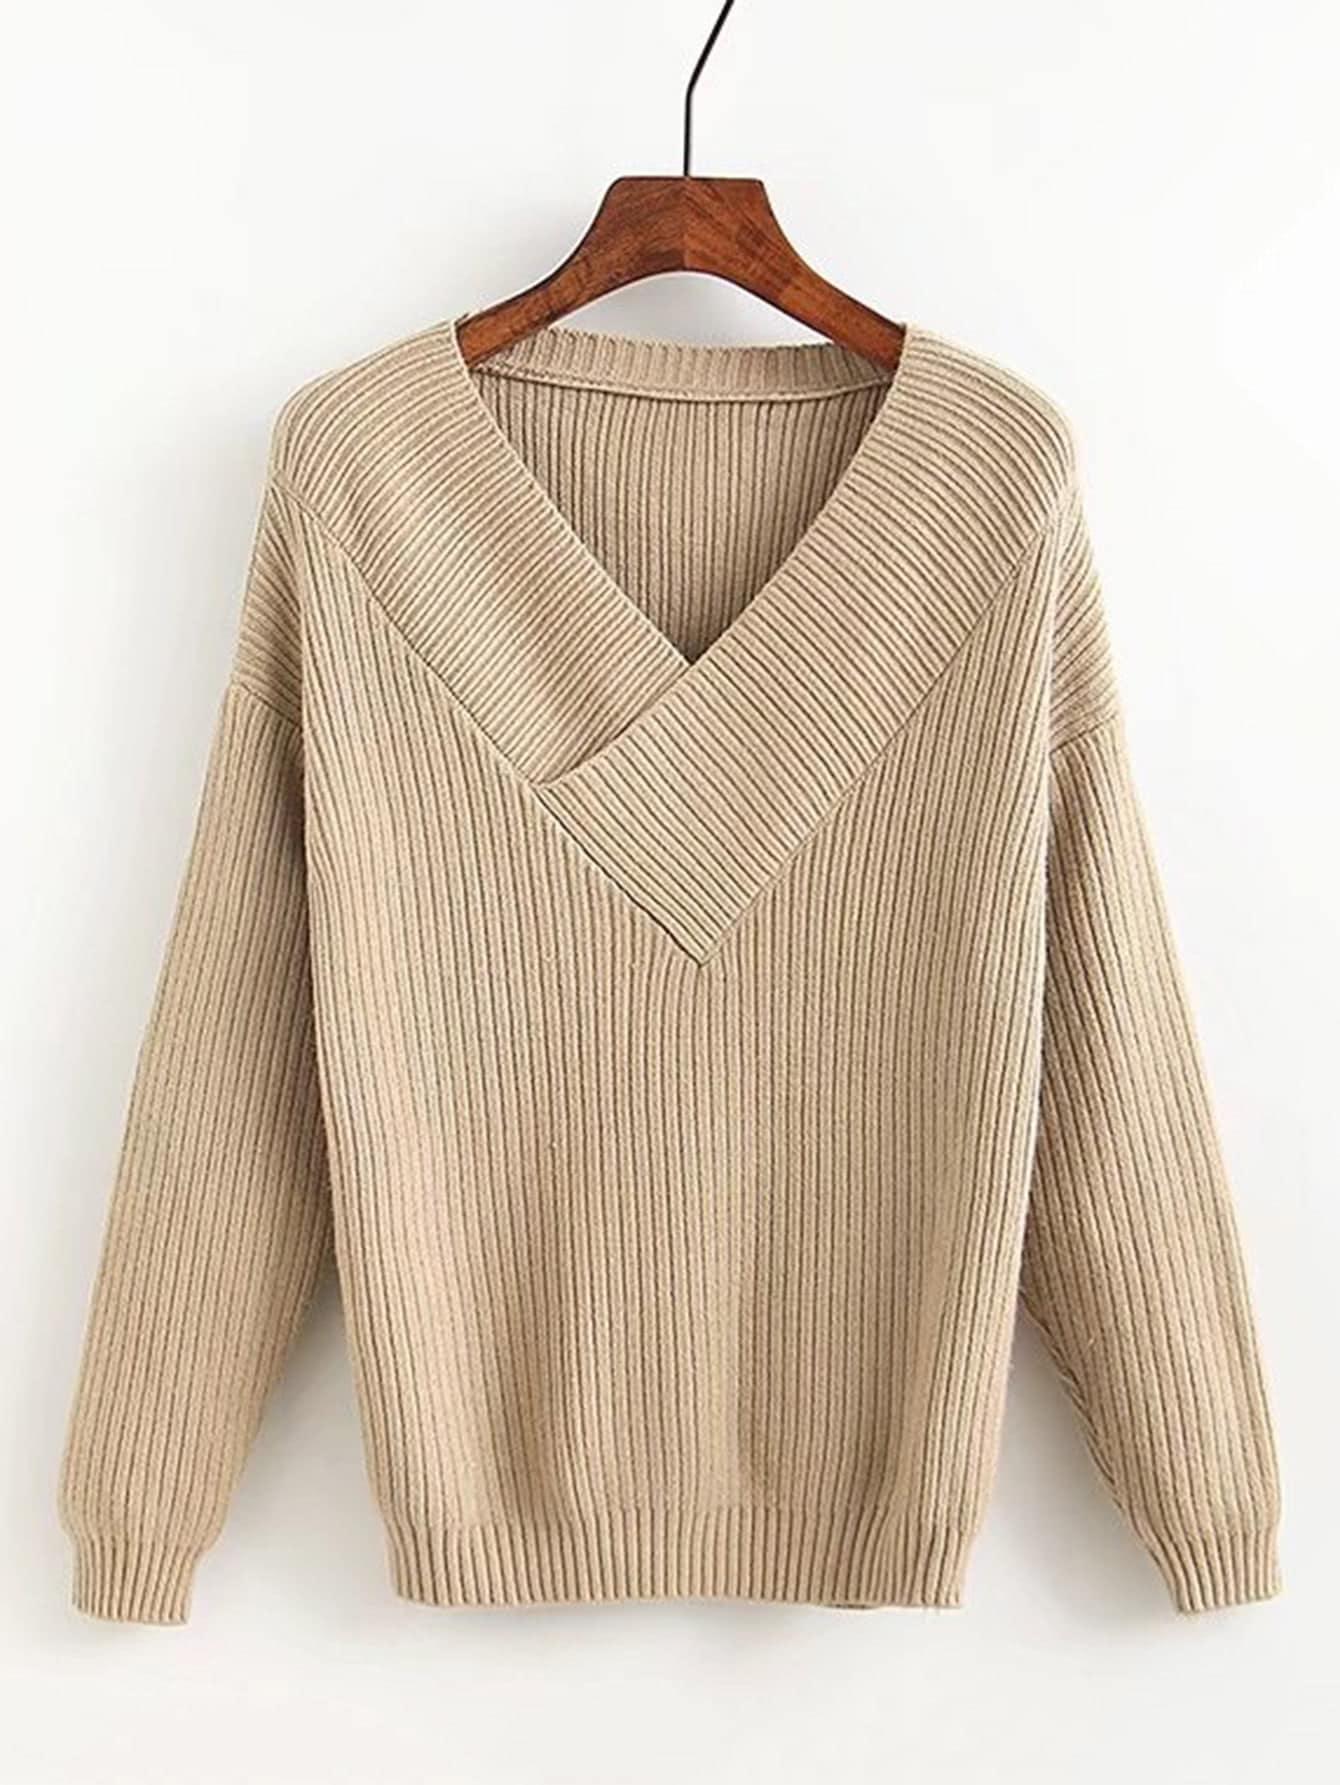 Surplice V Neck Ribbed Knitwear sweater170914204